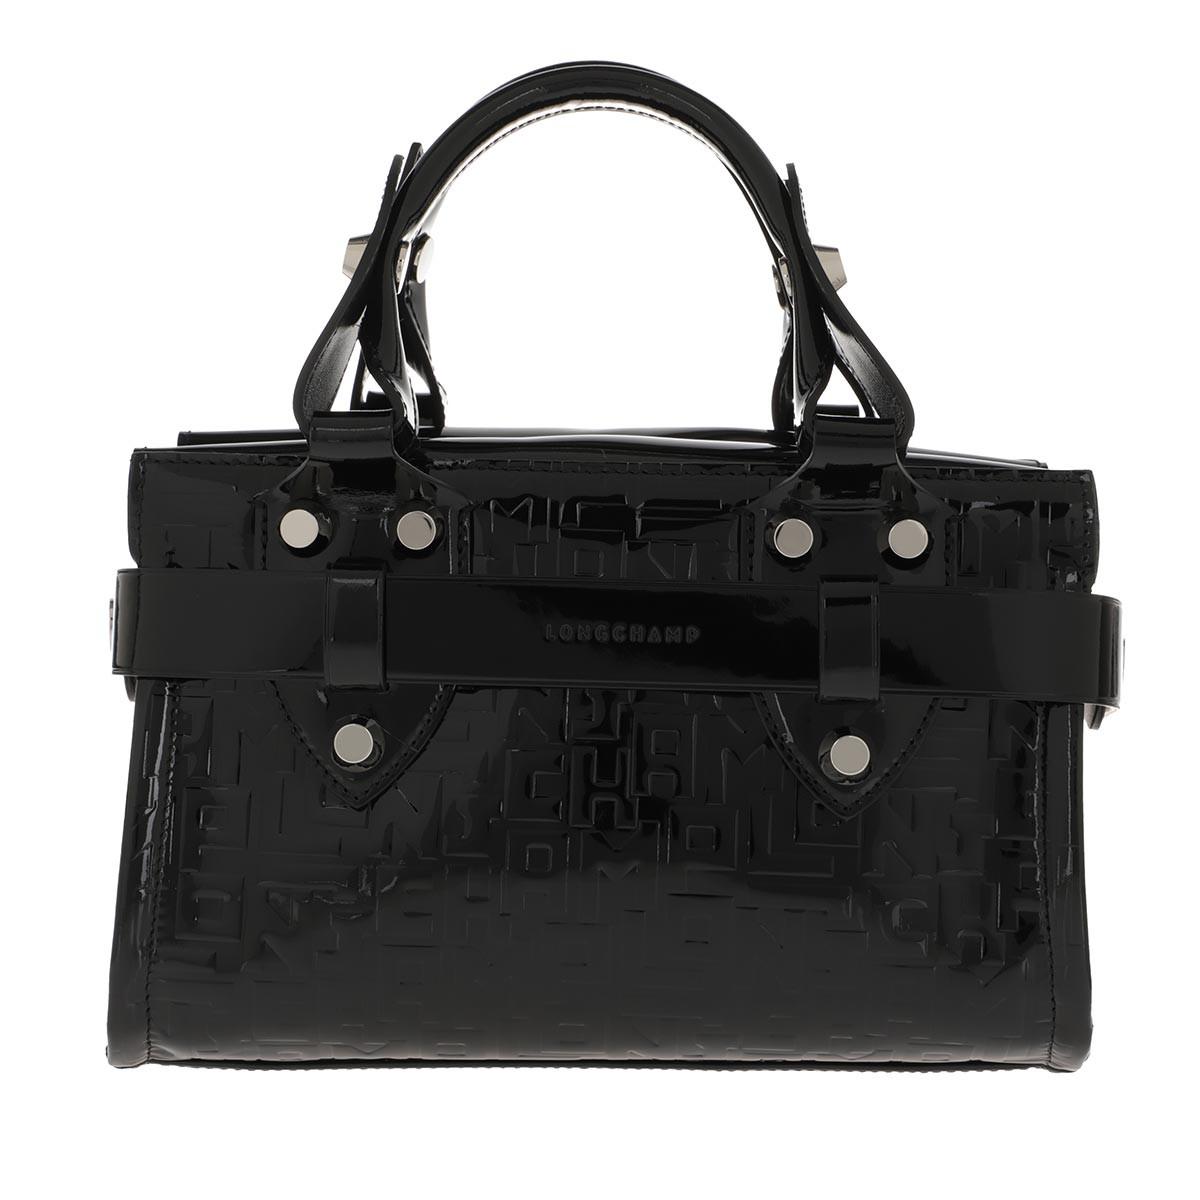 Longchamp Tote - La Voyageuse LGP Verni Small Tote Bag Black - in schwarz - für Damen